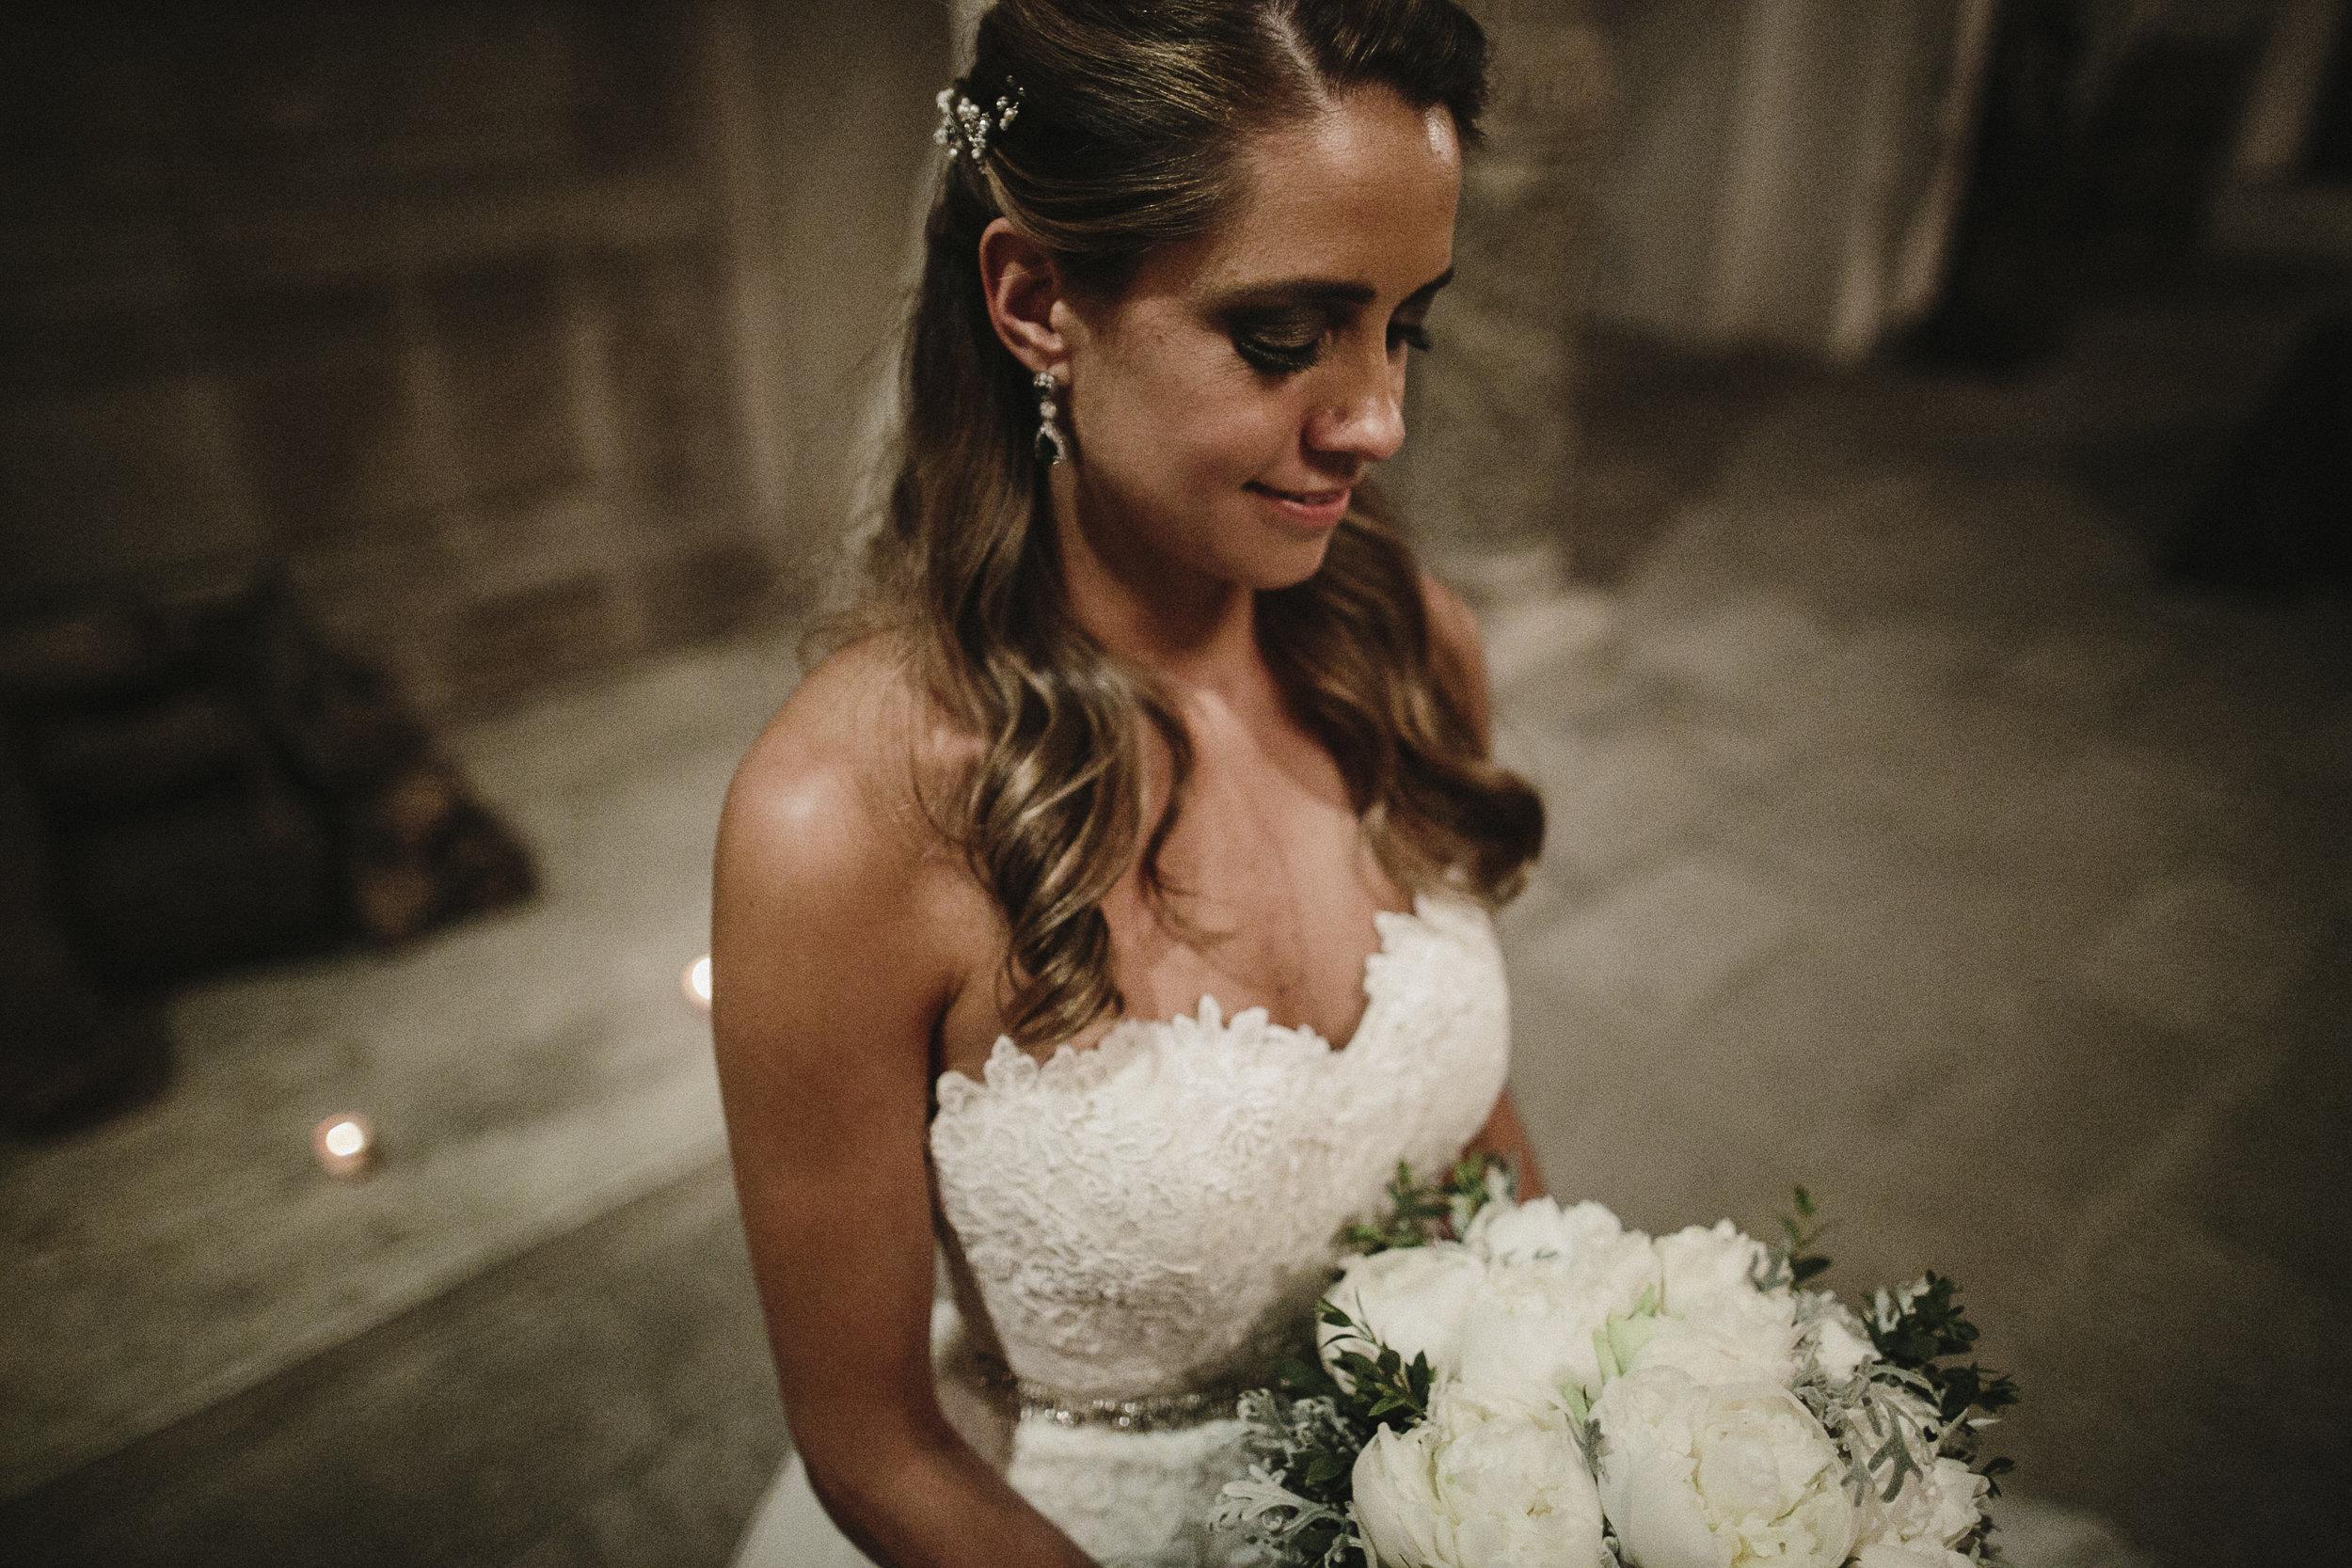 alfonso_flores_destination_wedding_photogrpahy_paola_alonso-832.JPG